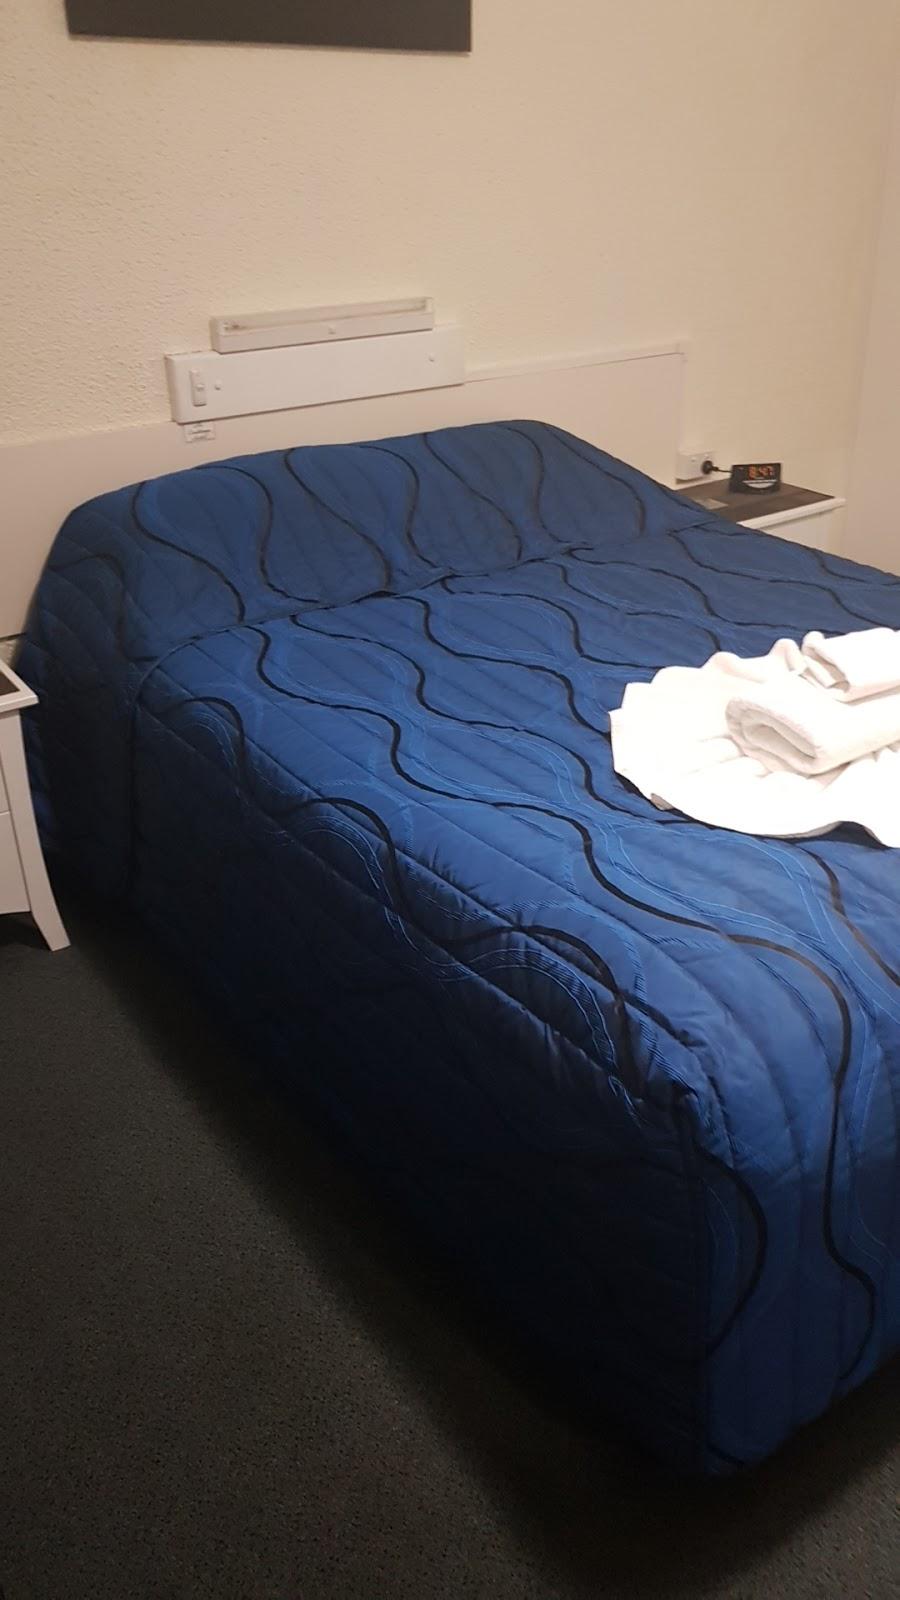 Benaraby Hilltop Motor Inn | lodging | 48902 Bruce Hwy, Benaraby QLD 4680, Australia | 0749750211 OR +61 7 4975 0211